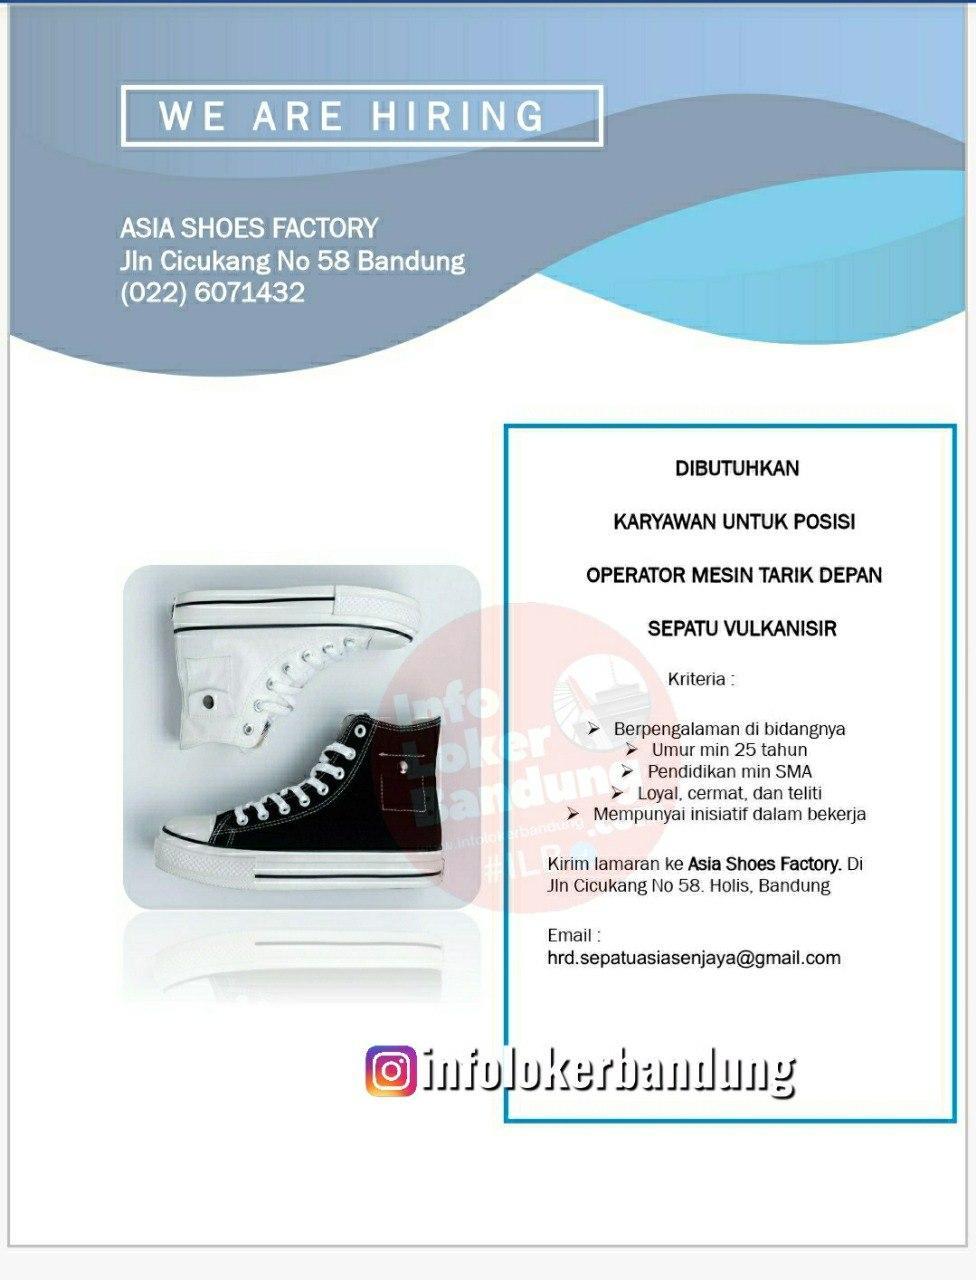 Lowongan Kerja Asia Shoes Factory Bandung September 2020